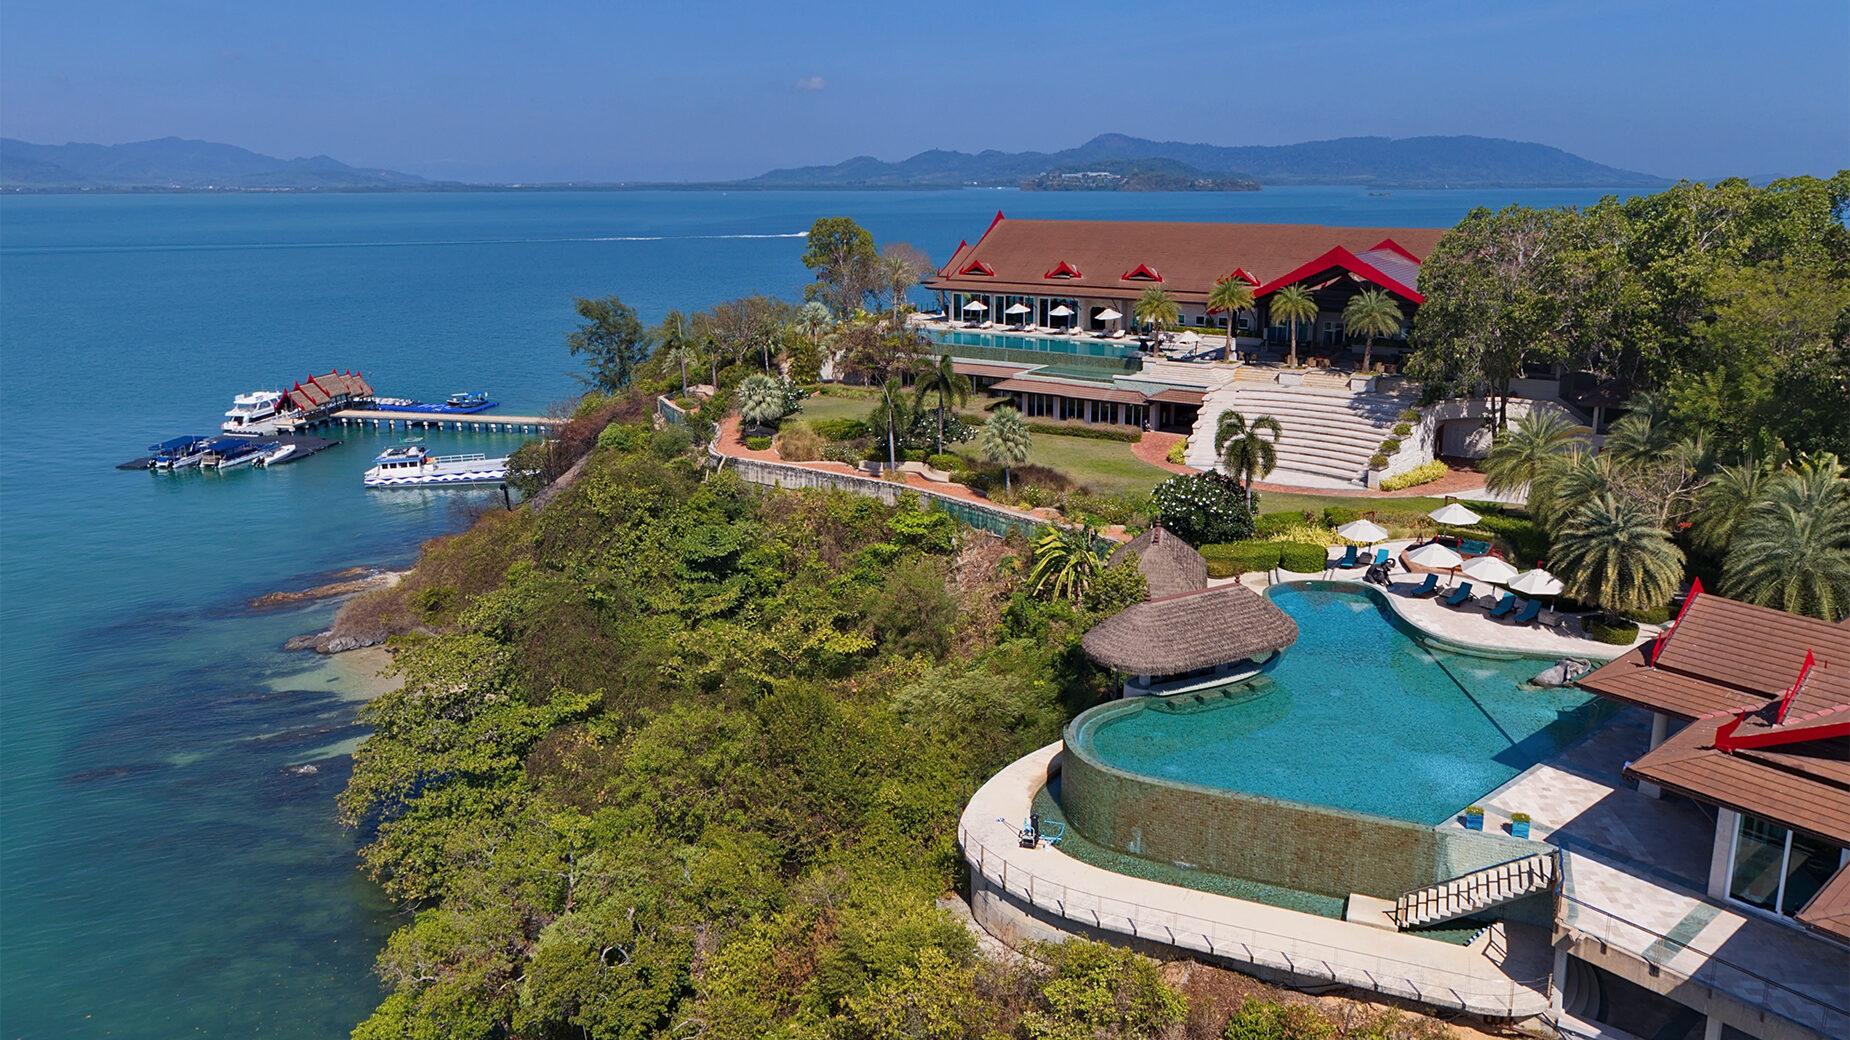 Private Island, Thailand